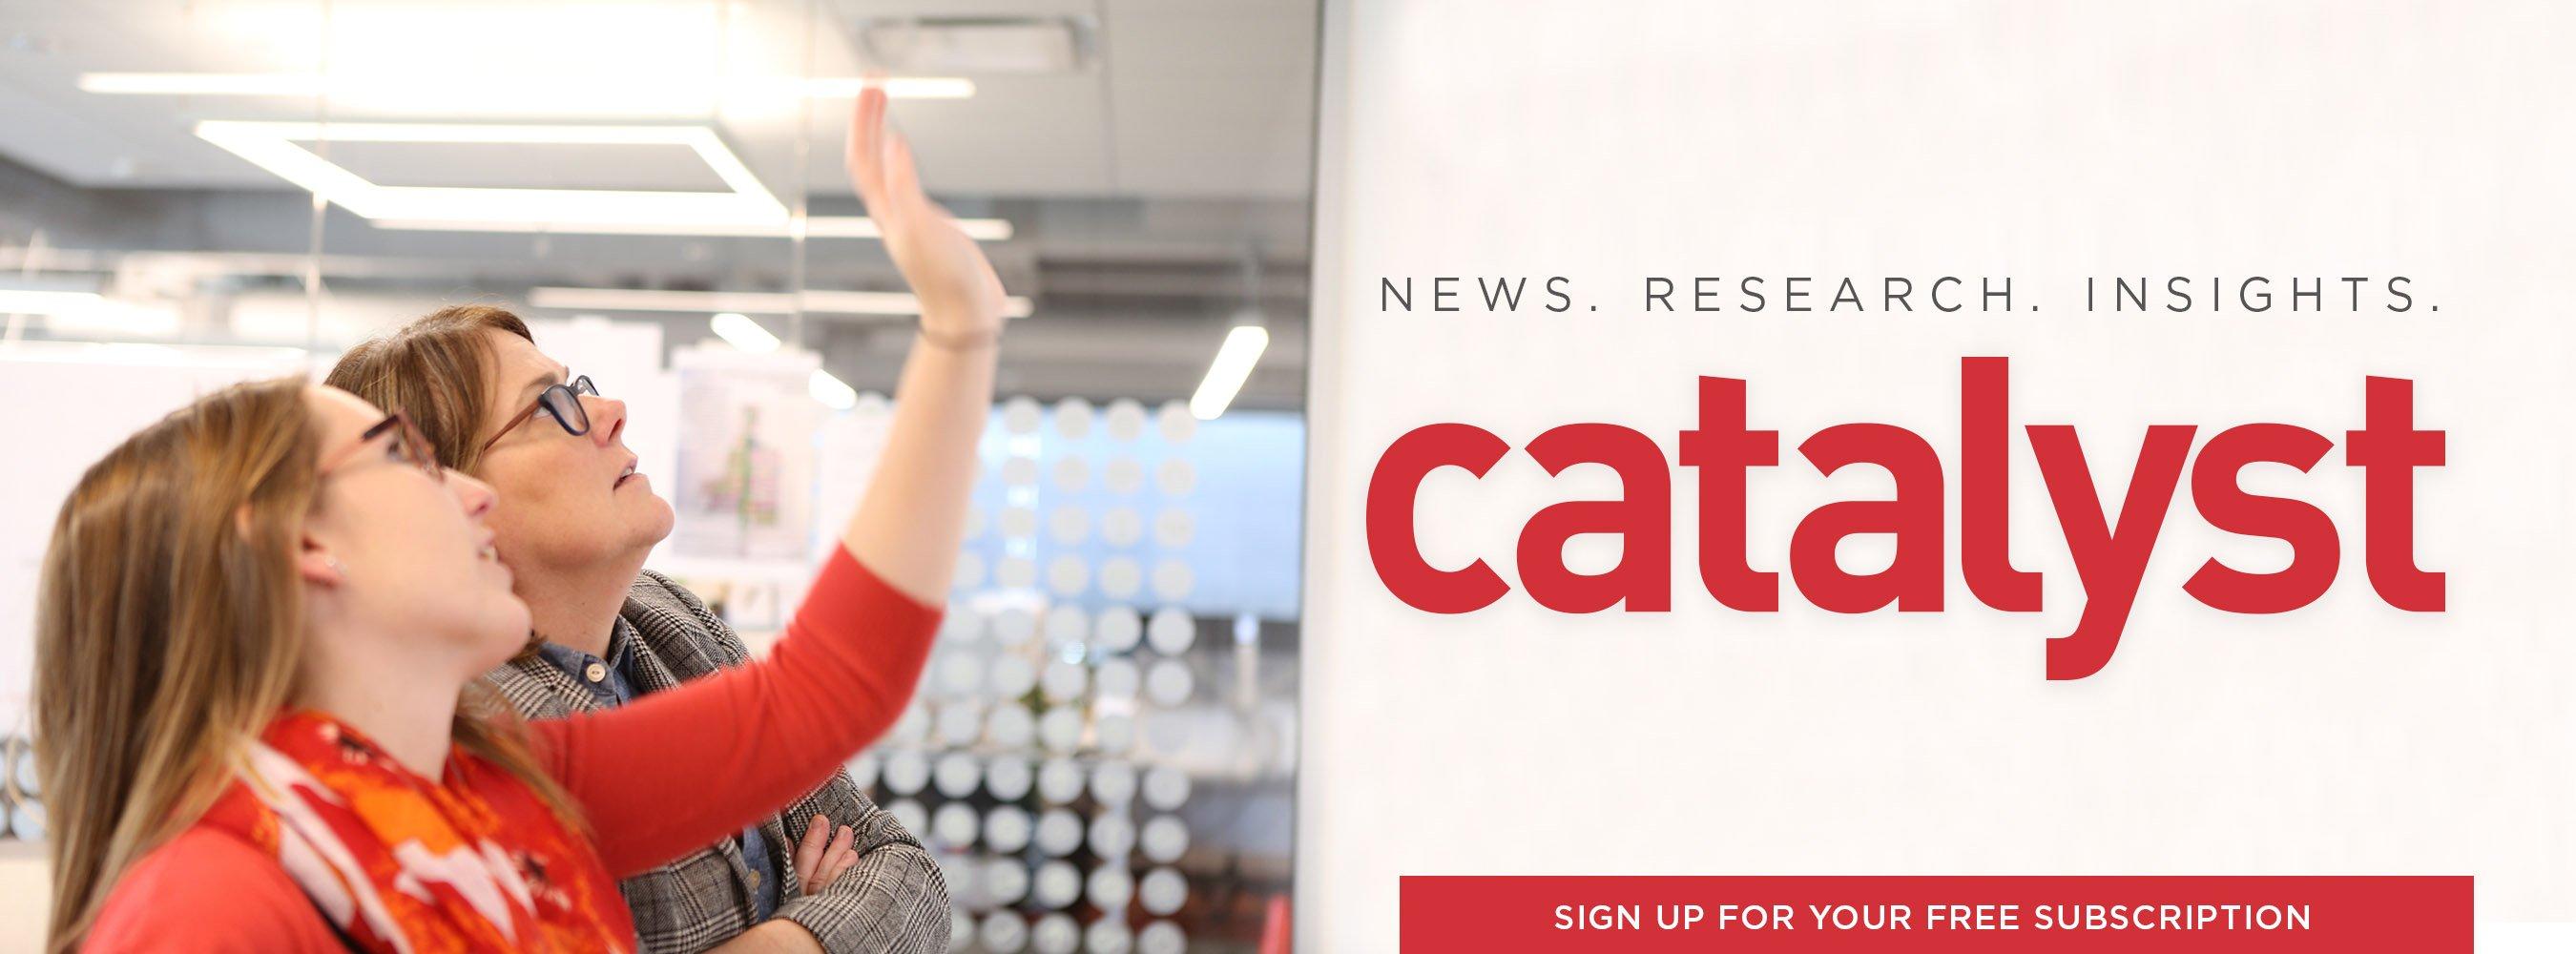 2017 Catalyst Release_FINAL-1.jpg